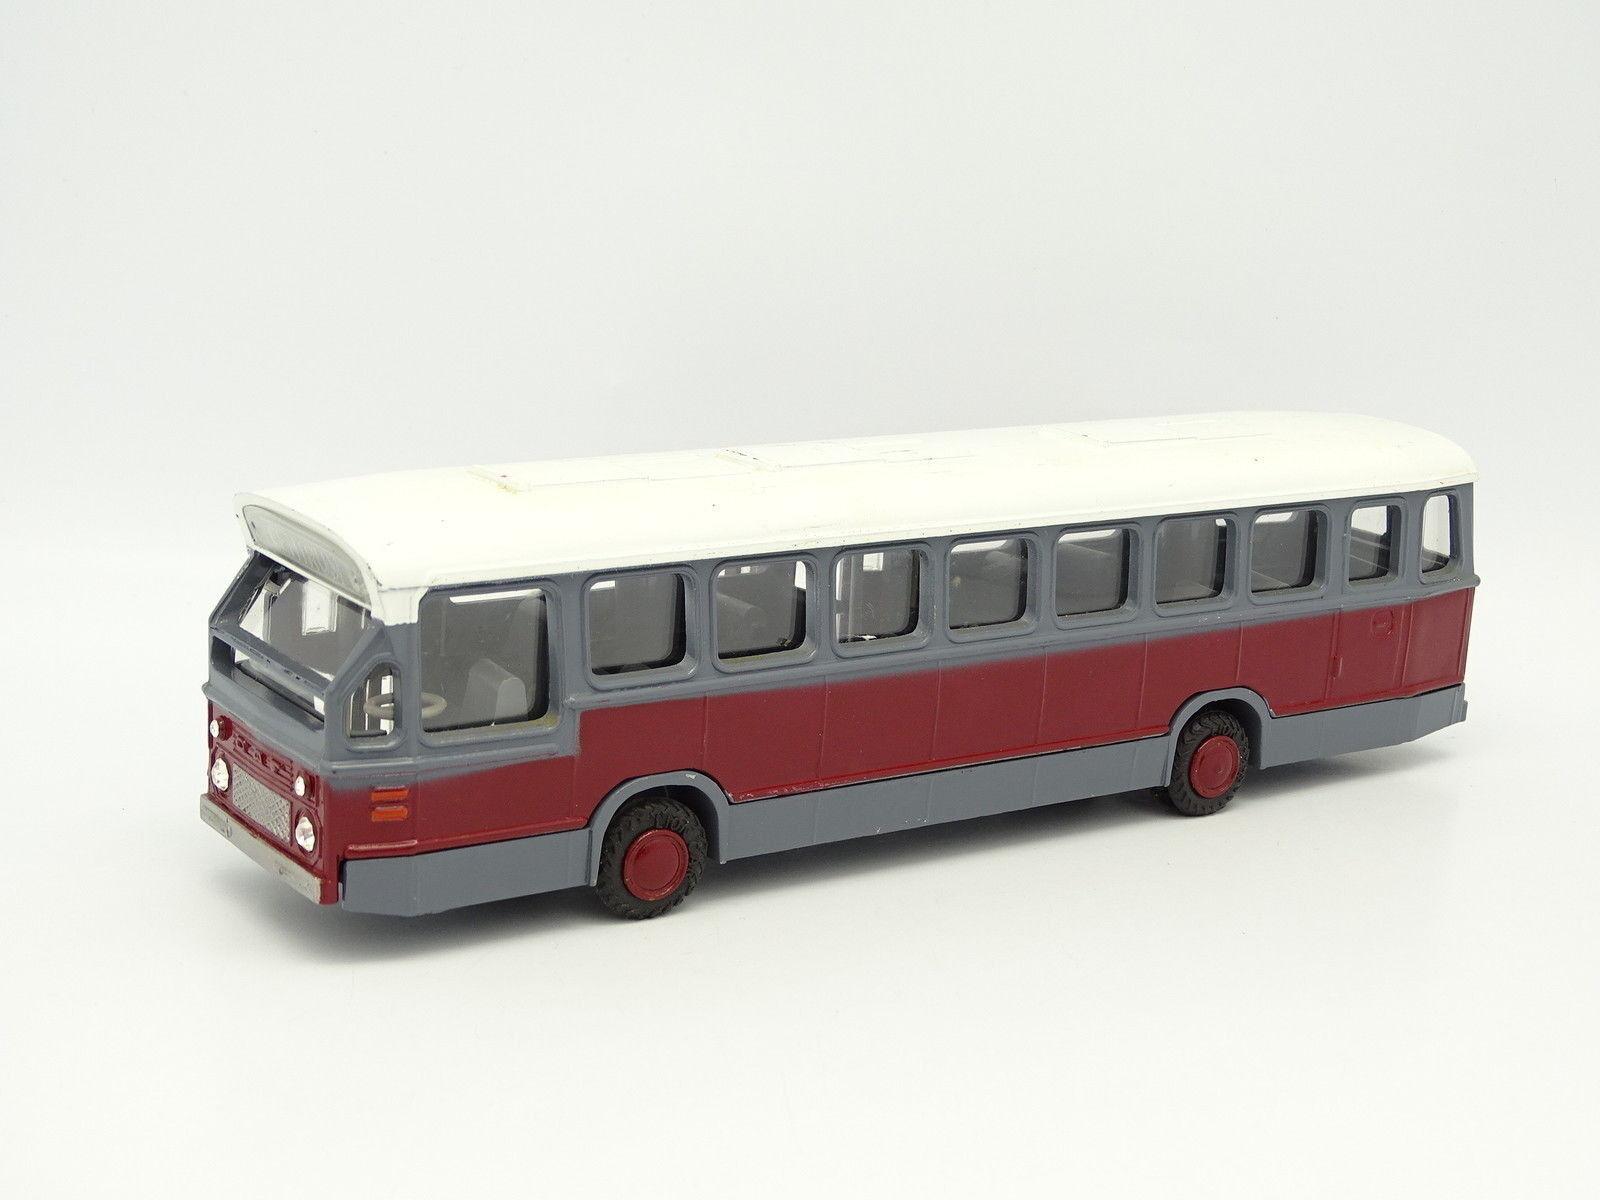 Lion Toys SB 1 50 - Bus Autobus DAF Citybus red